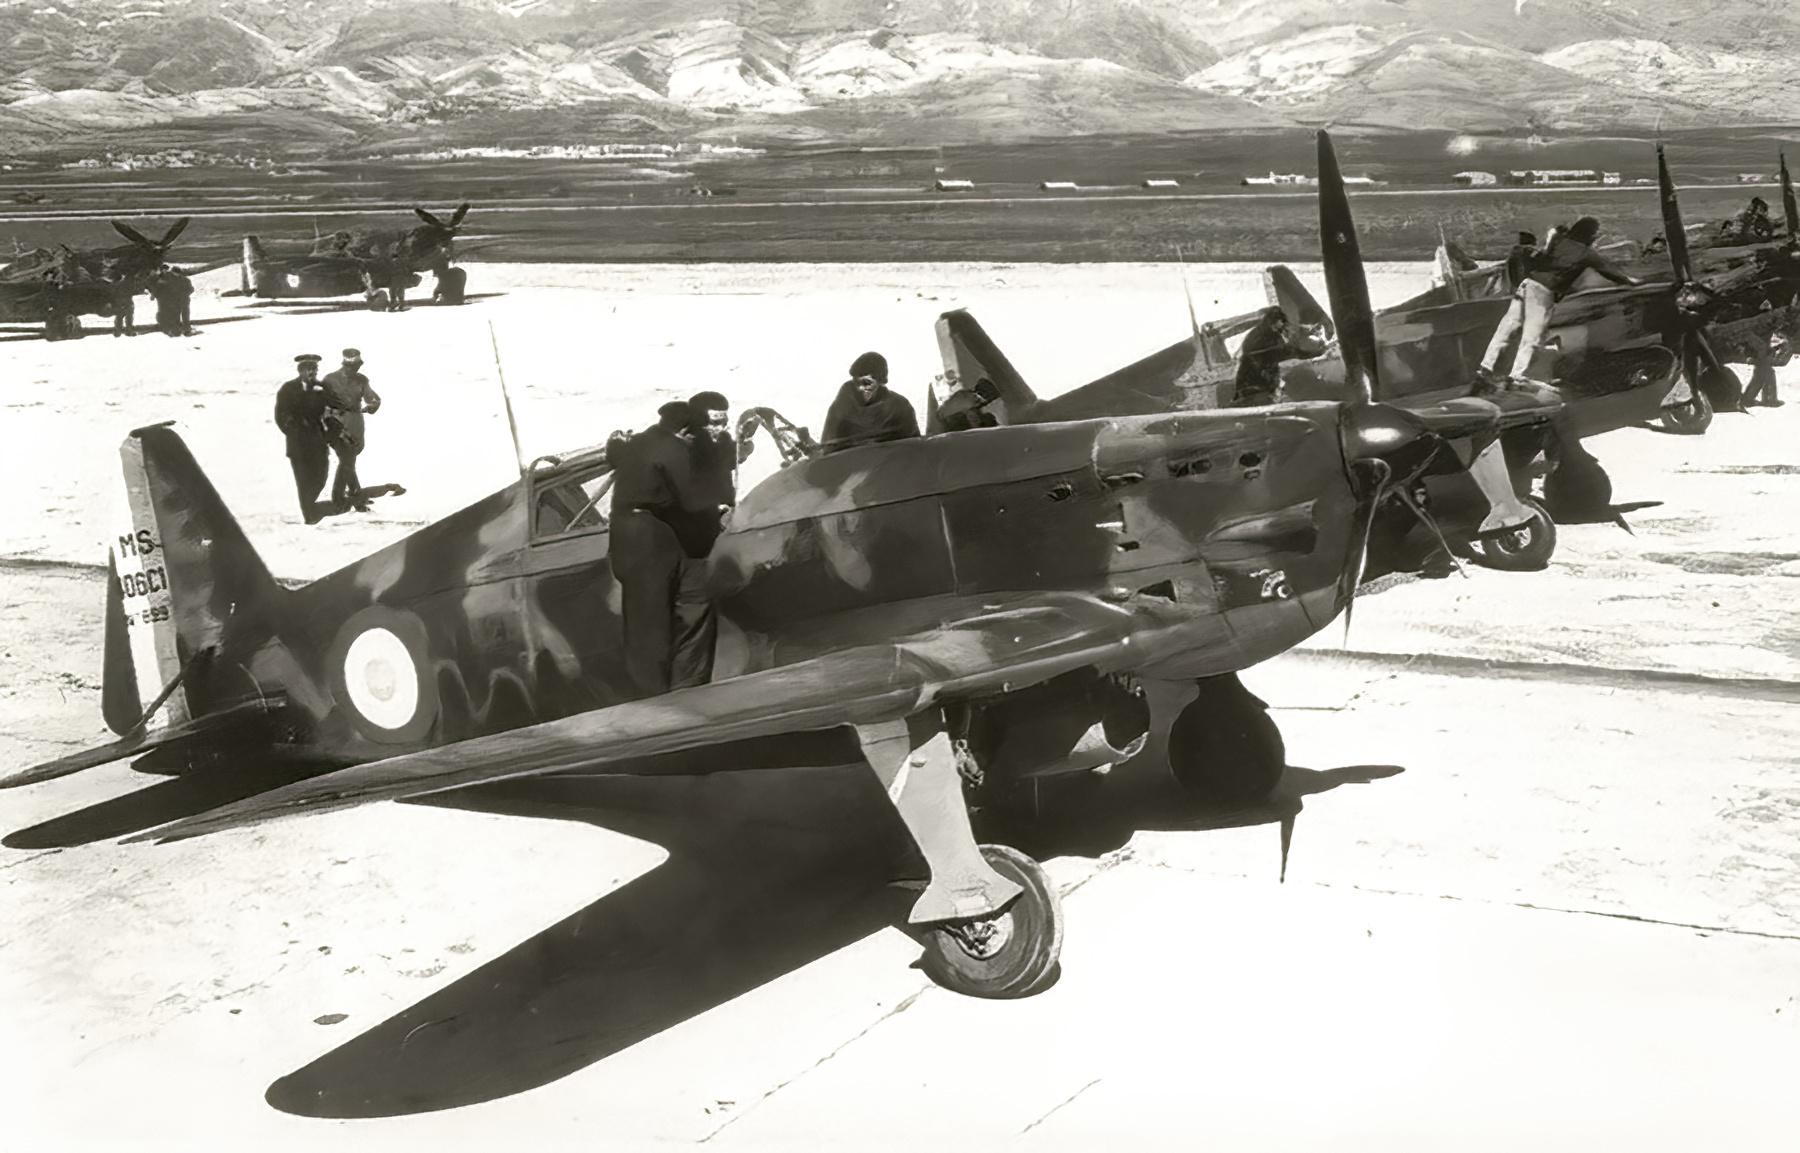 French Airforce Morane Saulnier MS 406C1 sn699 France 1940 web 01